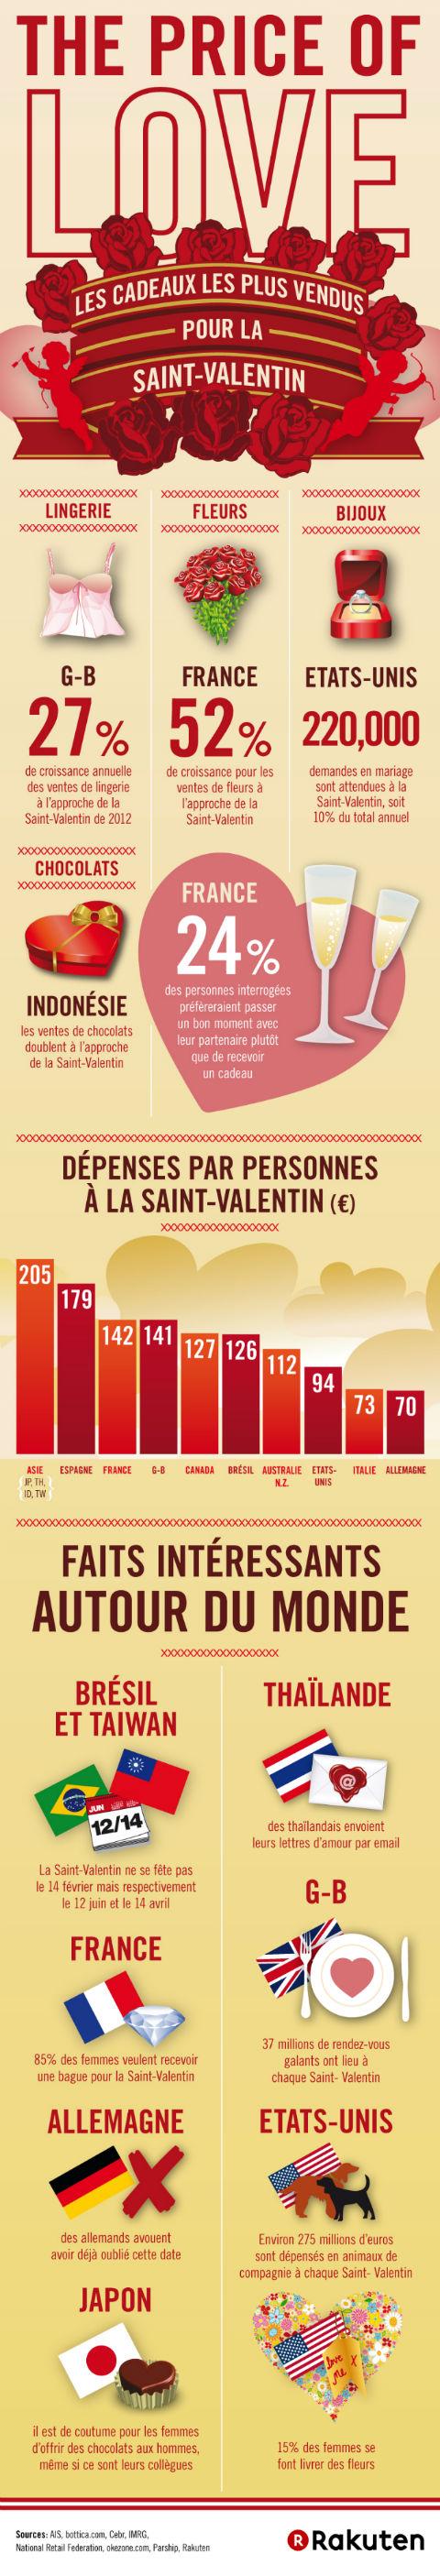 Infographie St valentin 2013